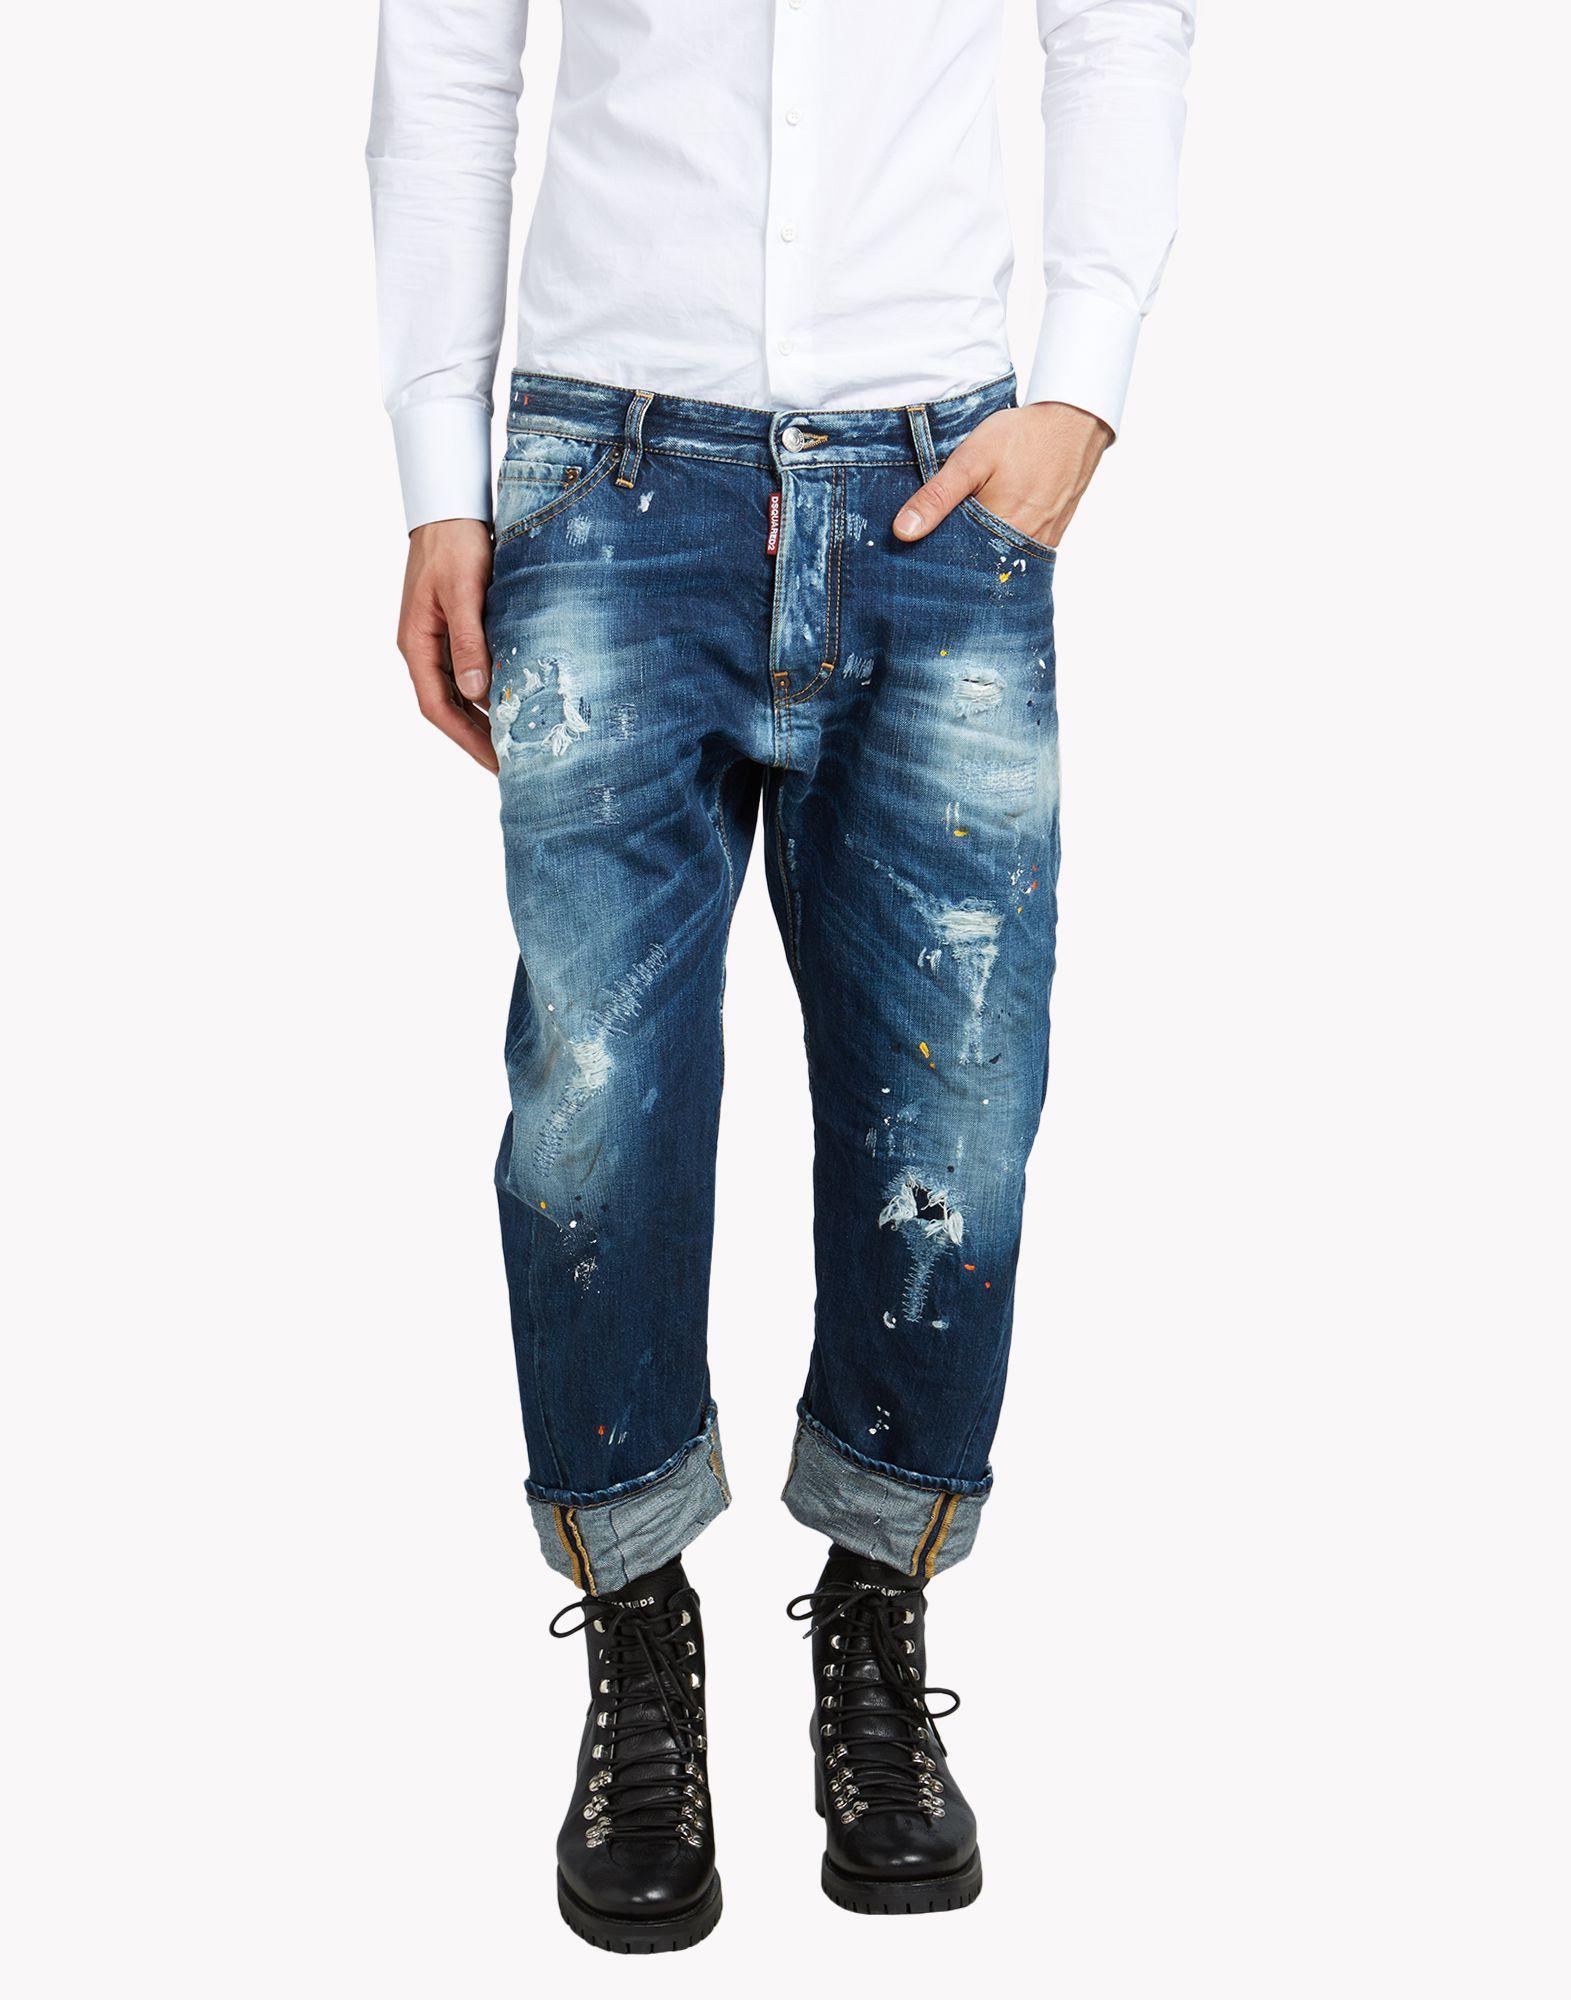 c07e75bc4df5 Workwear Jeans - 5 Pockets Men - Dsquared Official Online Store ...